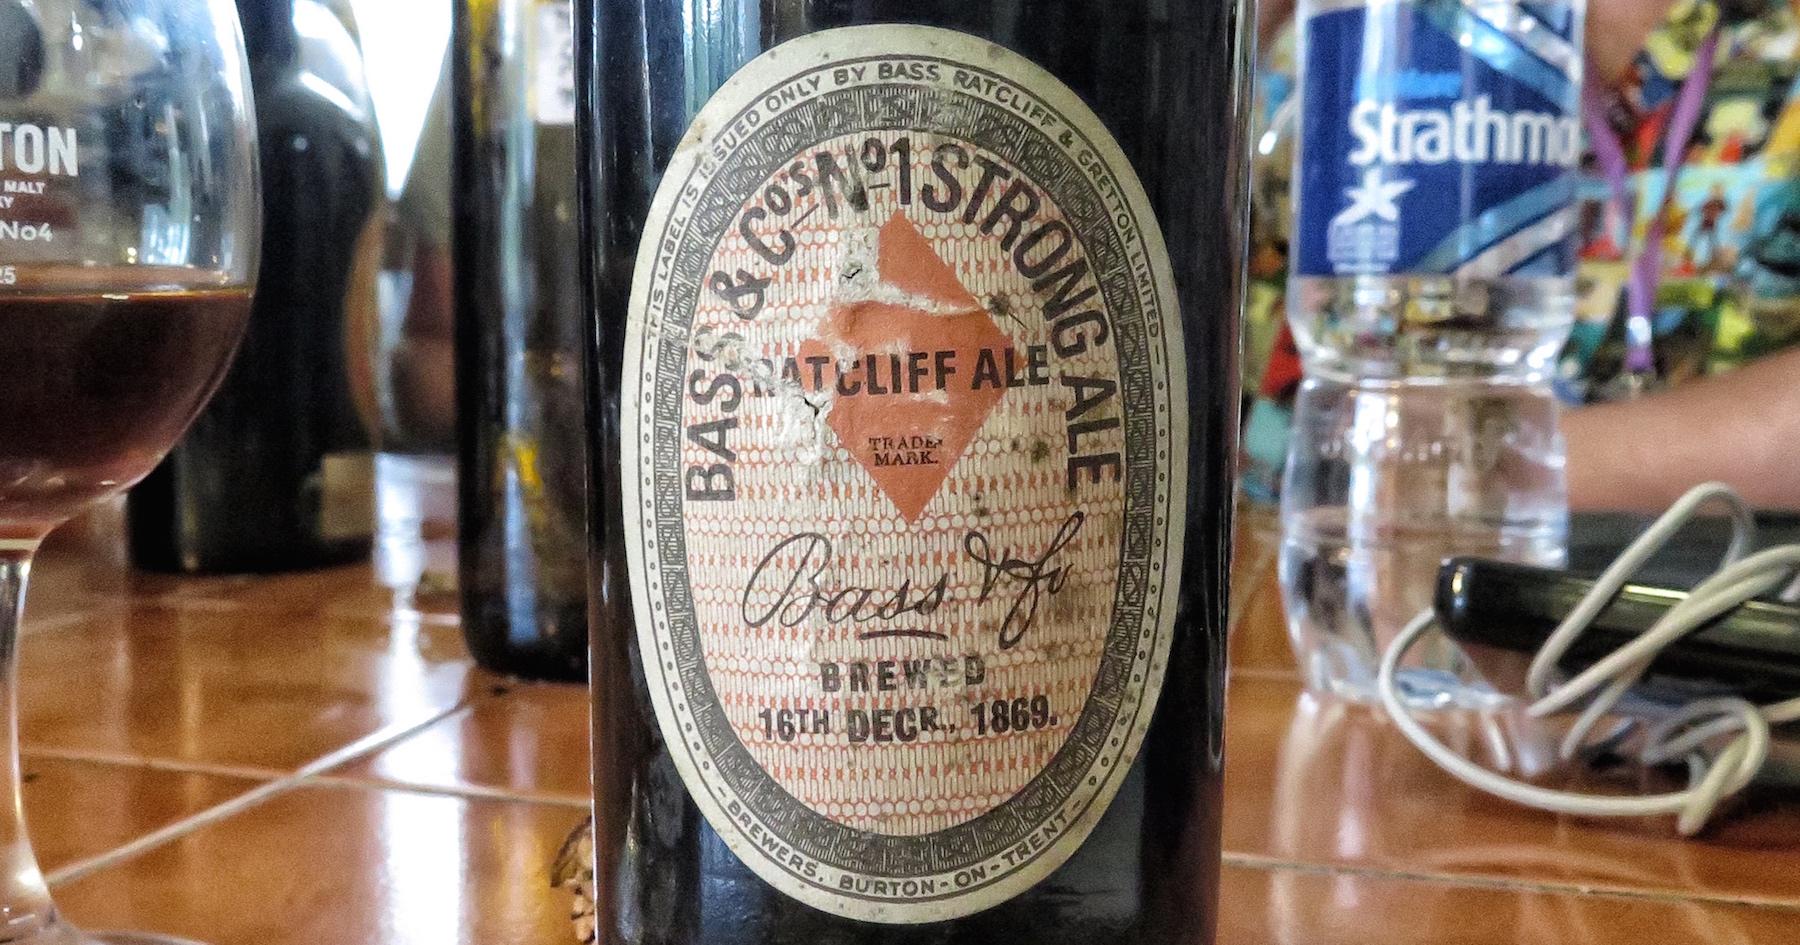 Bass Ratcliff Ale 1869